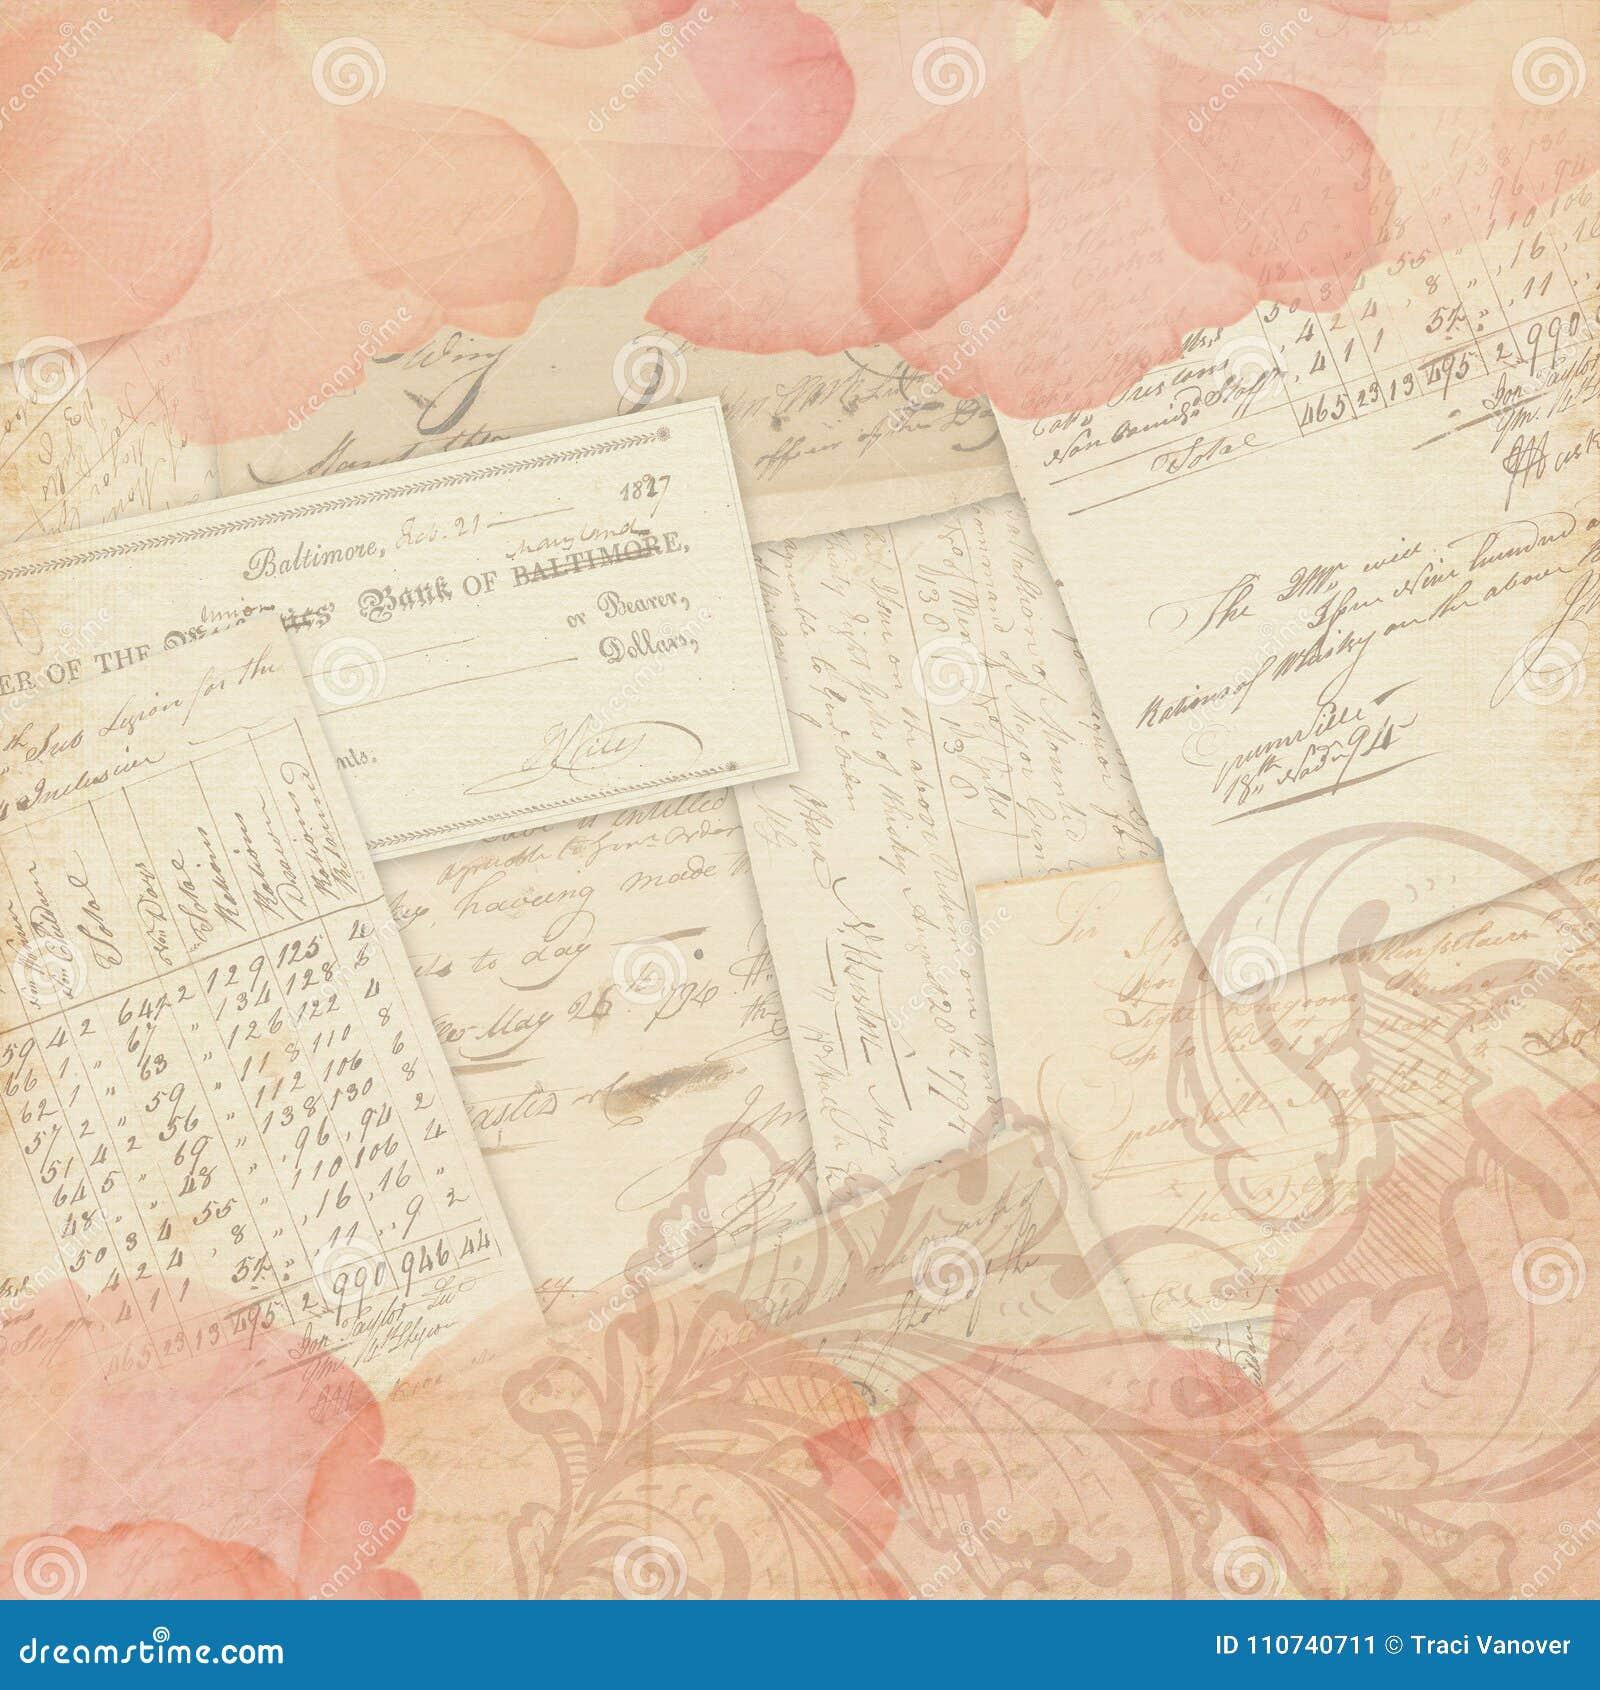 Vintage Collage Background - Scrapbook Paper Design - Mixed Media Stock - Rose Petals and Ephemera